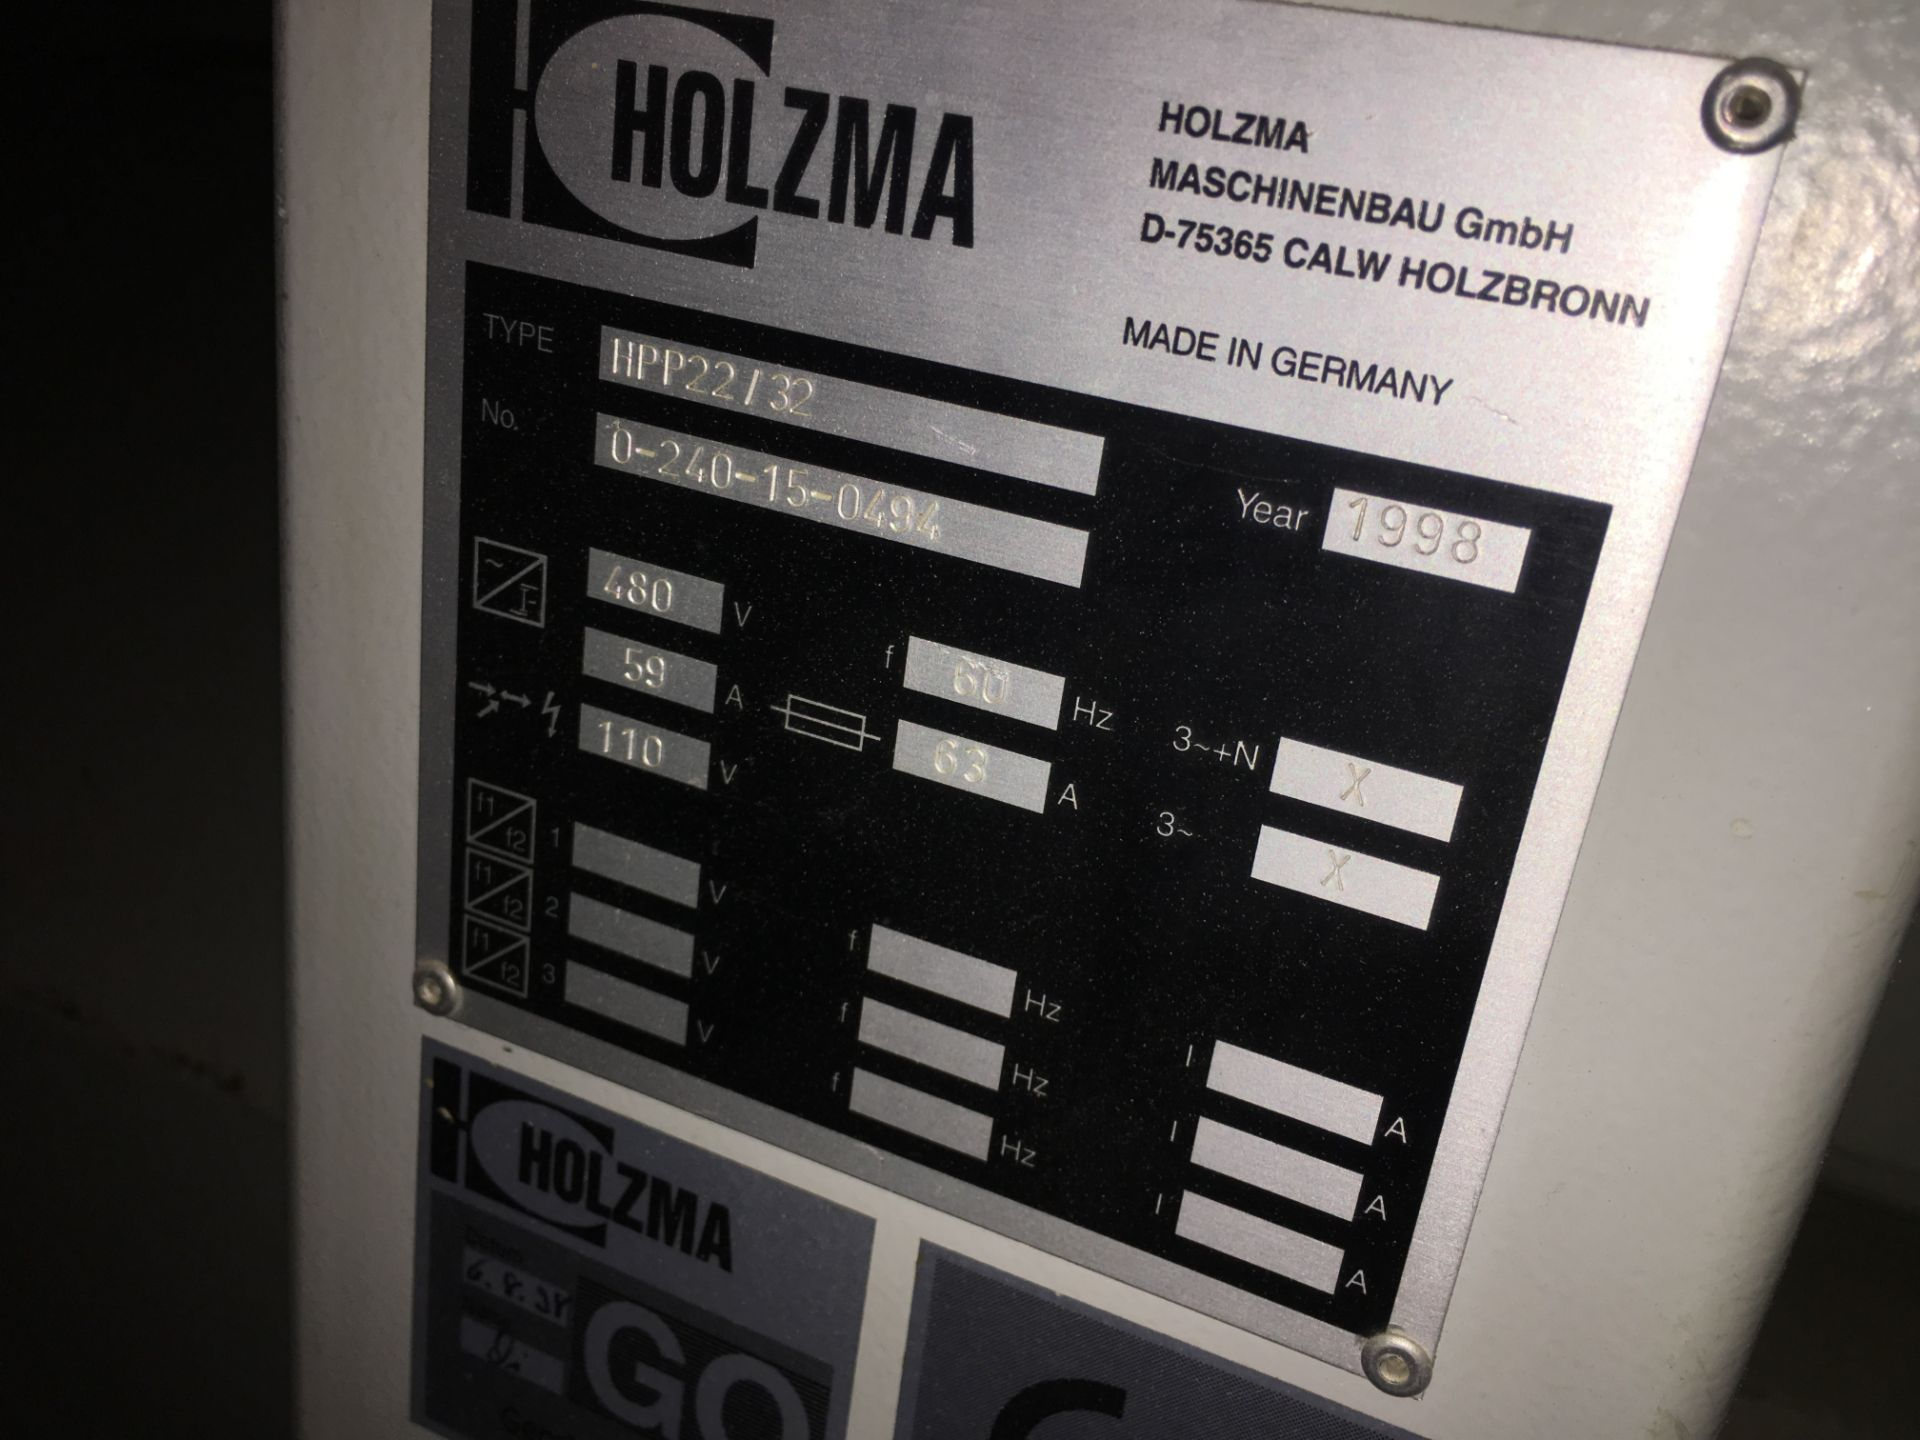 HOLZMA (HPP22/32) CNC PANEL SAW - Image 4 of 4